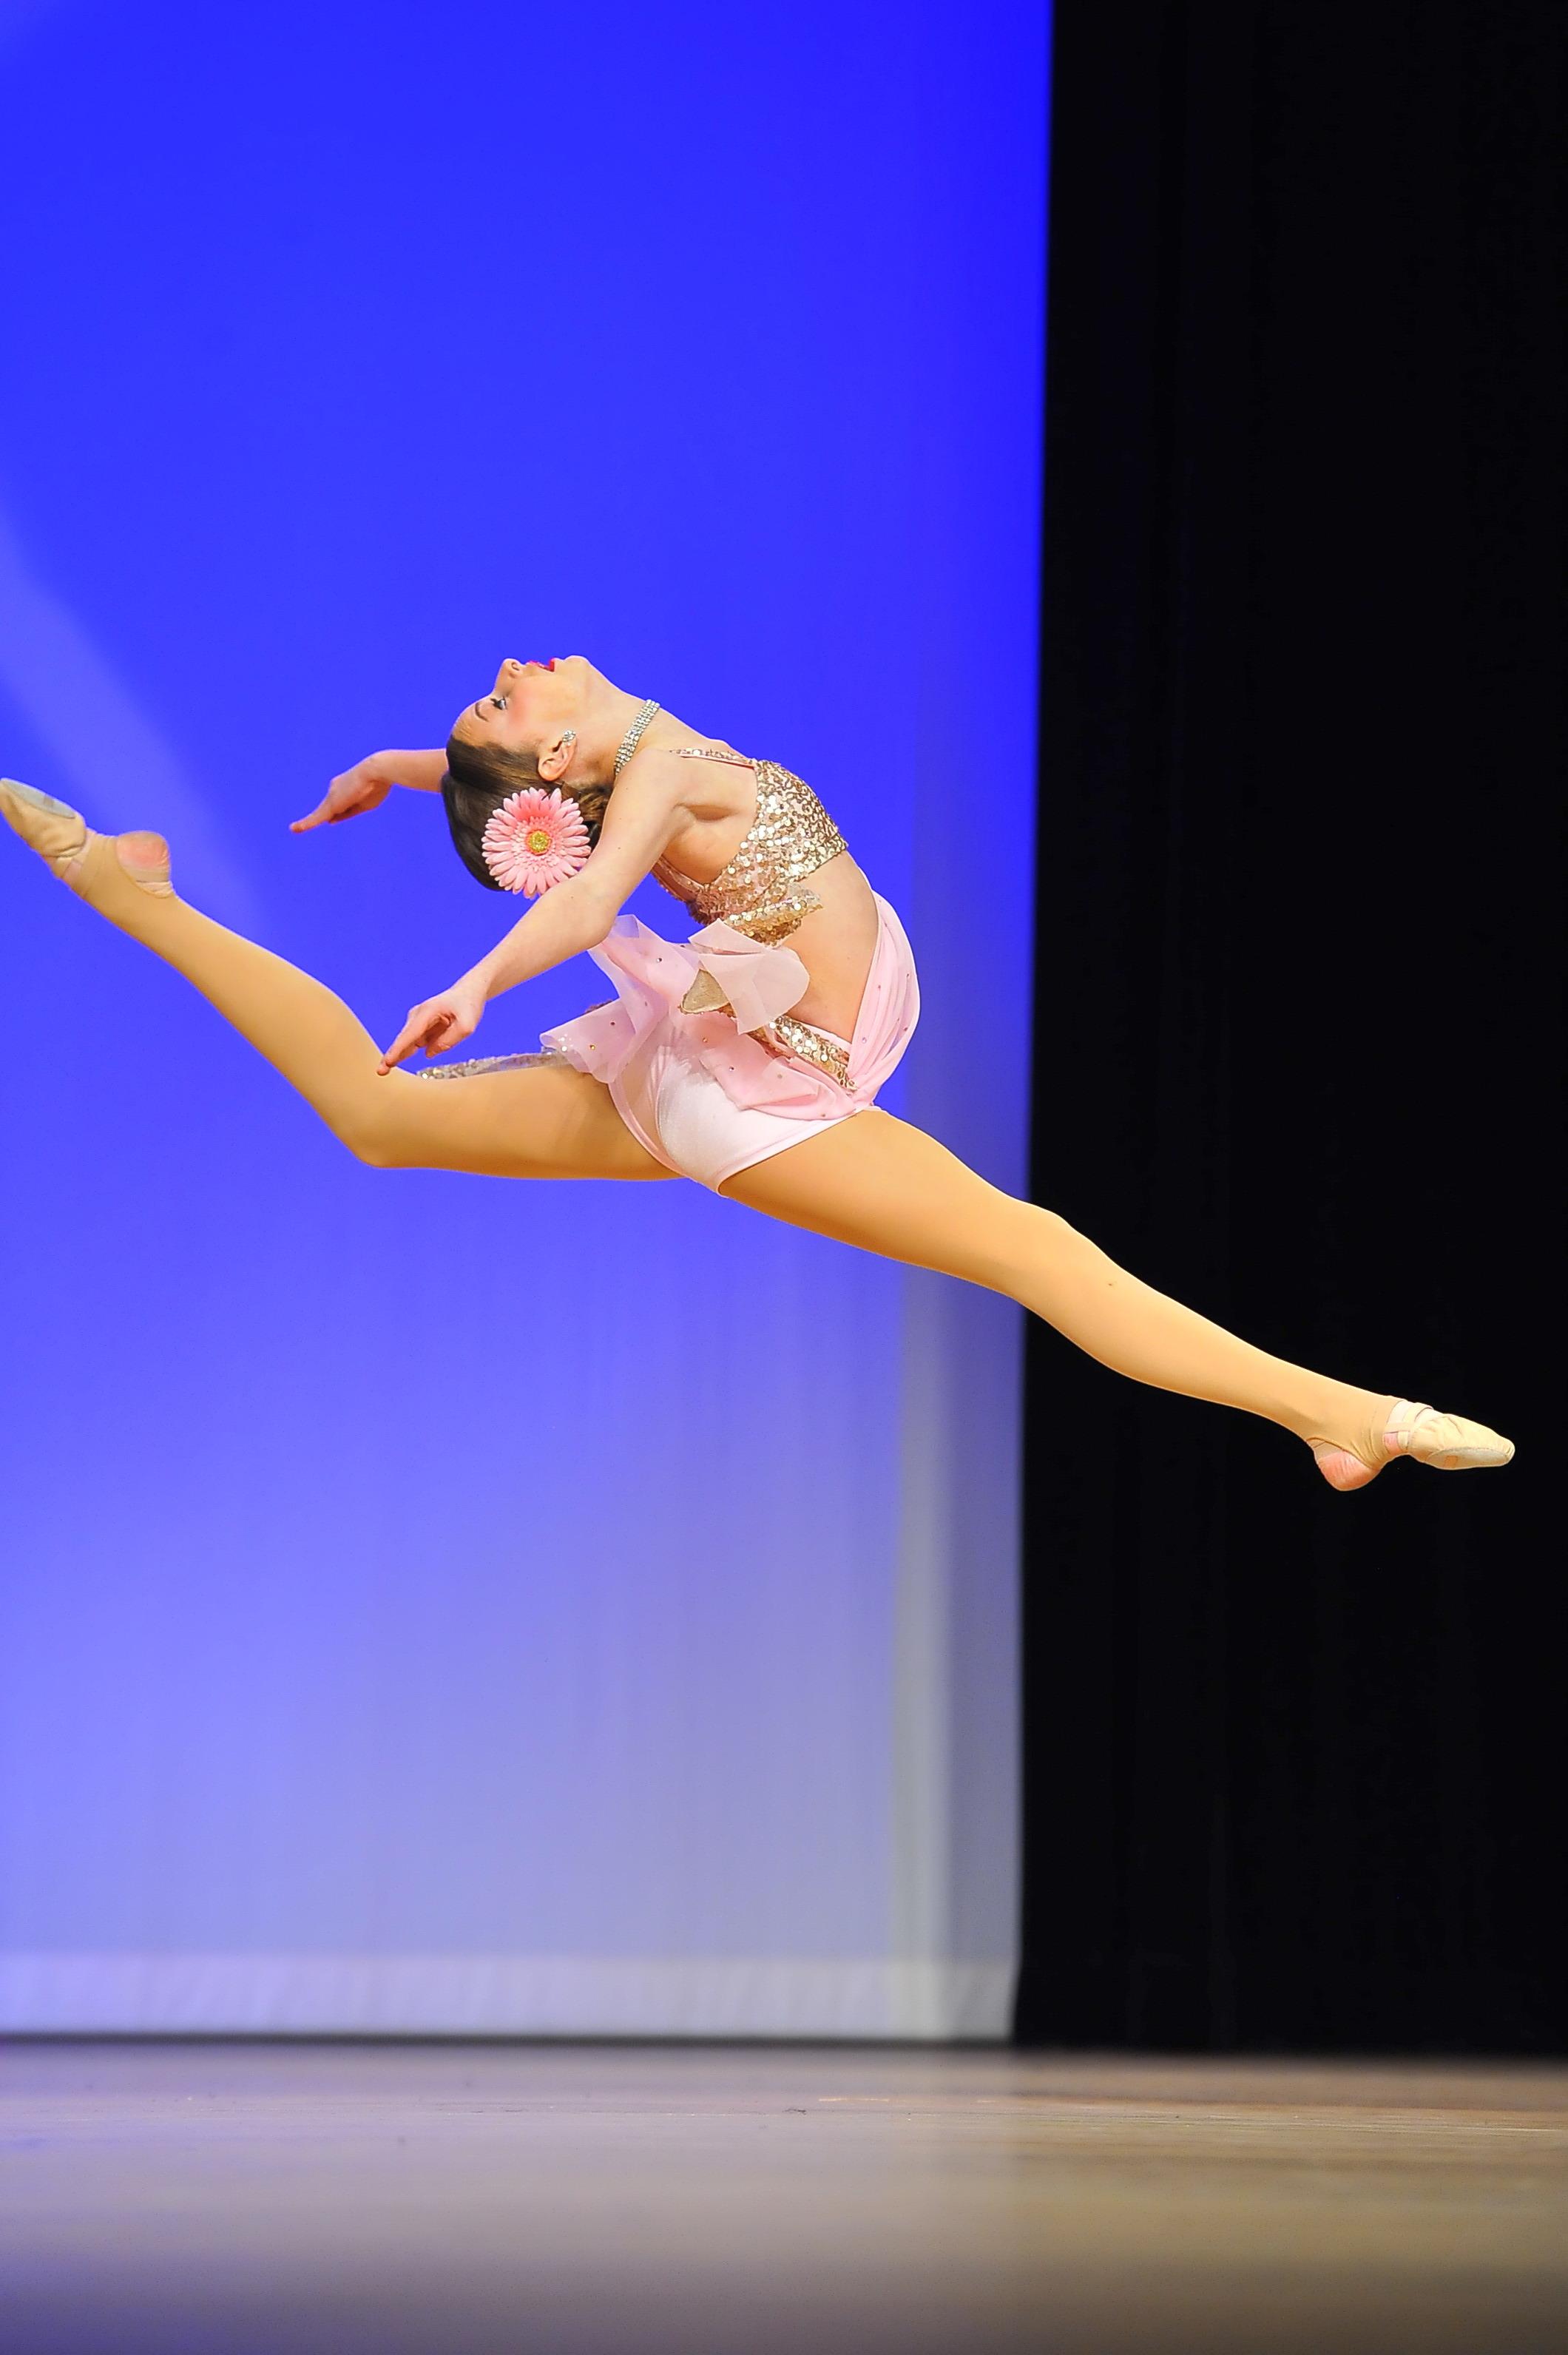 2013 - Allison Guse from Arabesque School of Dance